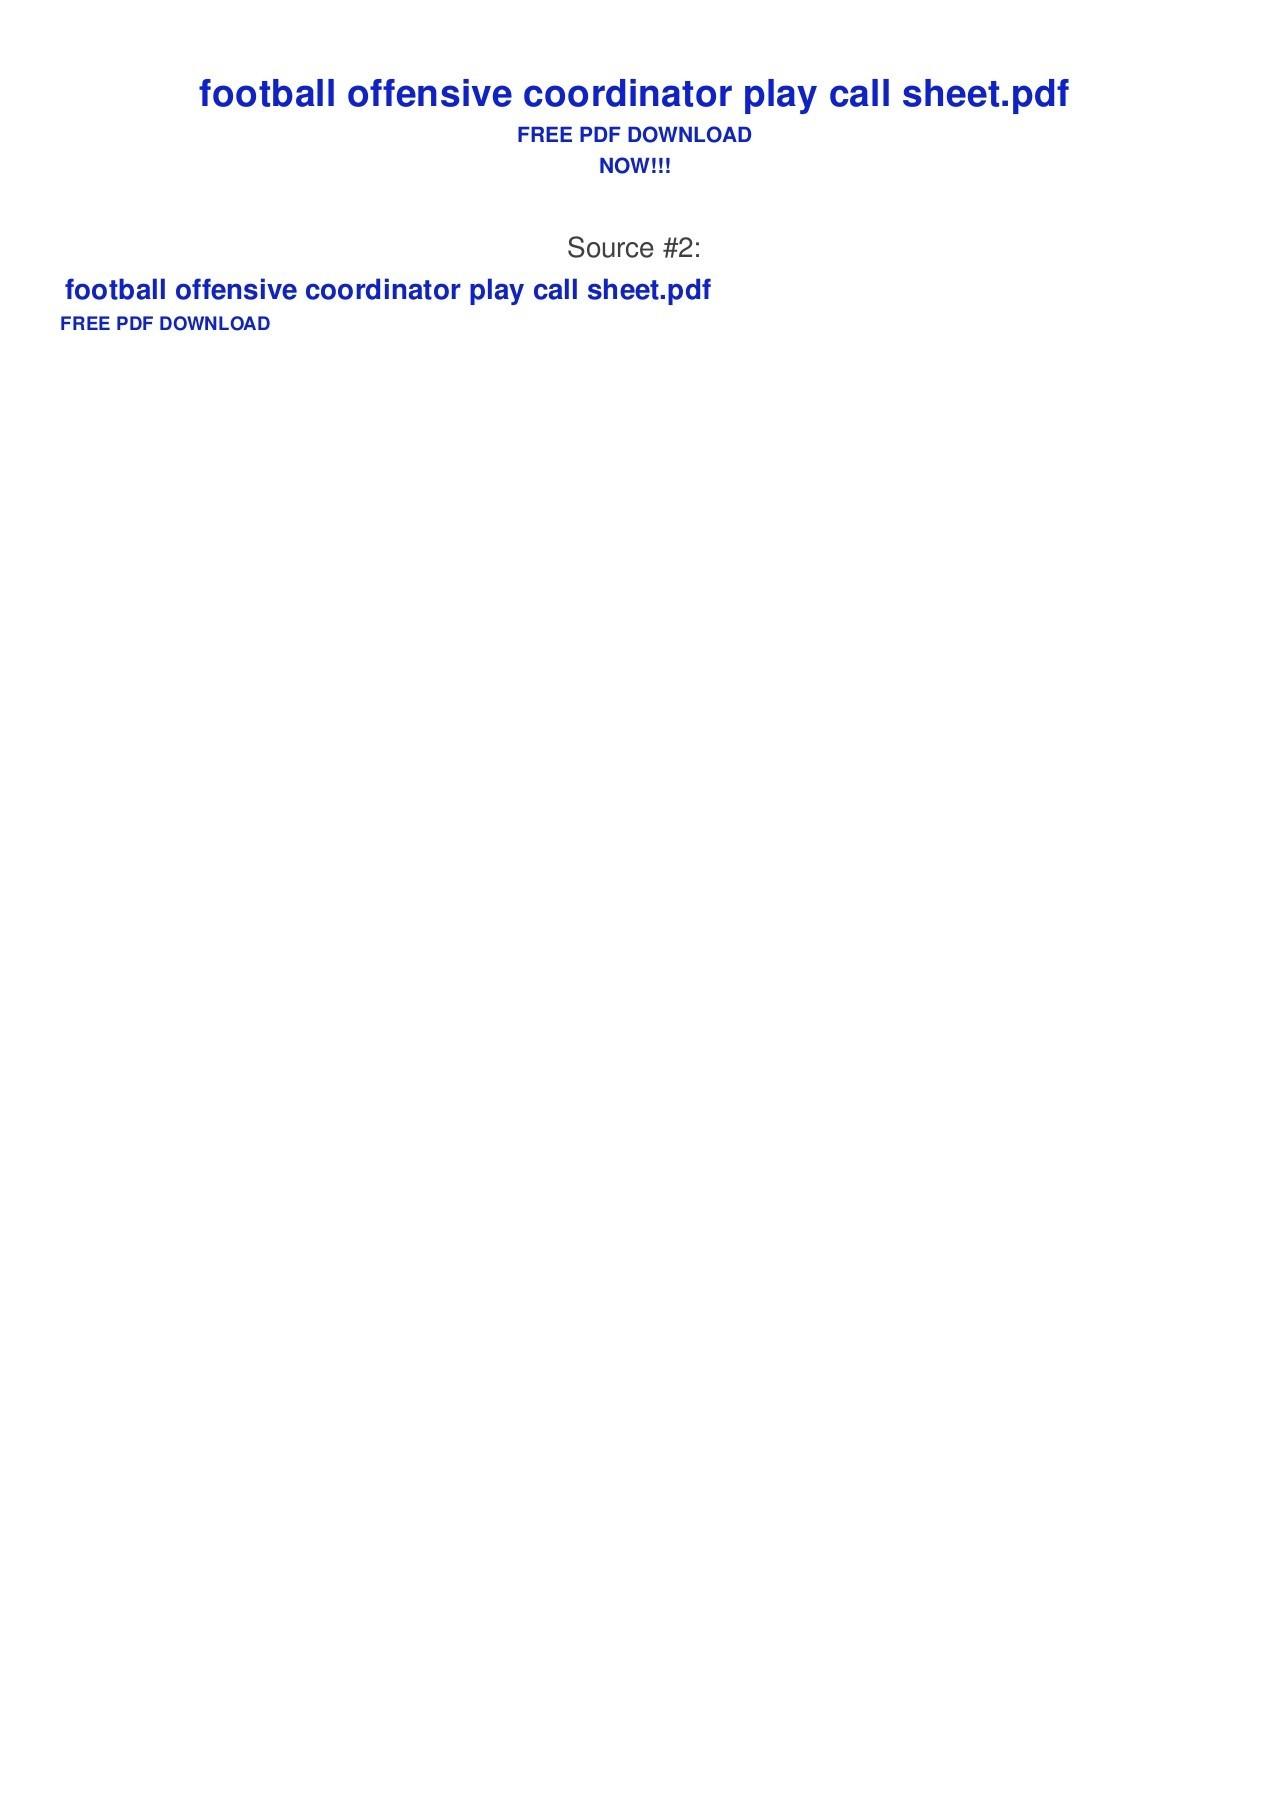 Football Offensive Coordinator Play Call Sheet Pages 1 - 2 - Text - Fantasy Football Draft Sheets Printable Free